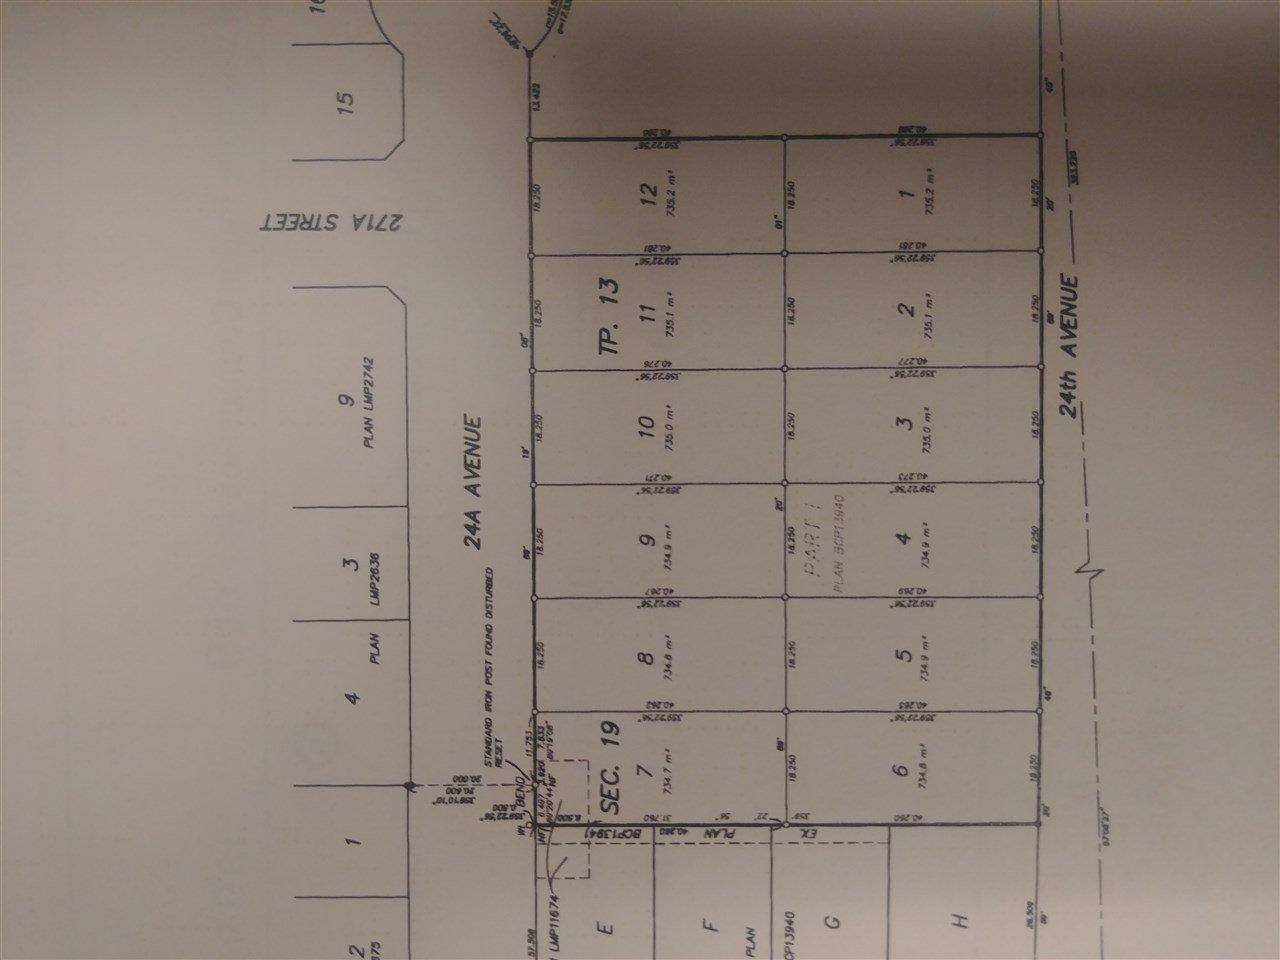 Main Photo: LT.6 24 AVENUE in Langley: Aldergrove Langley Land for sale : MLS®# R2319352